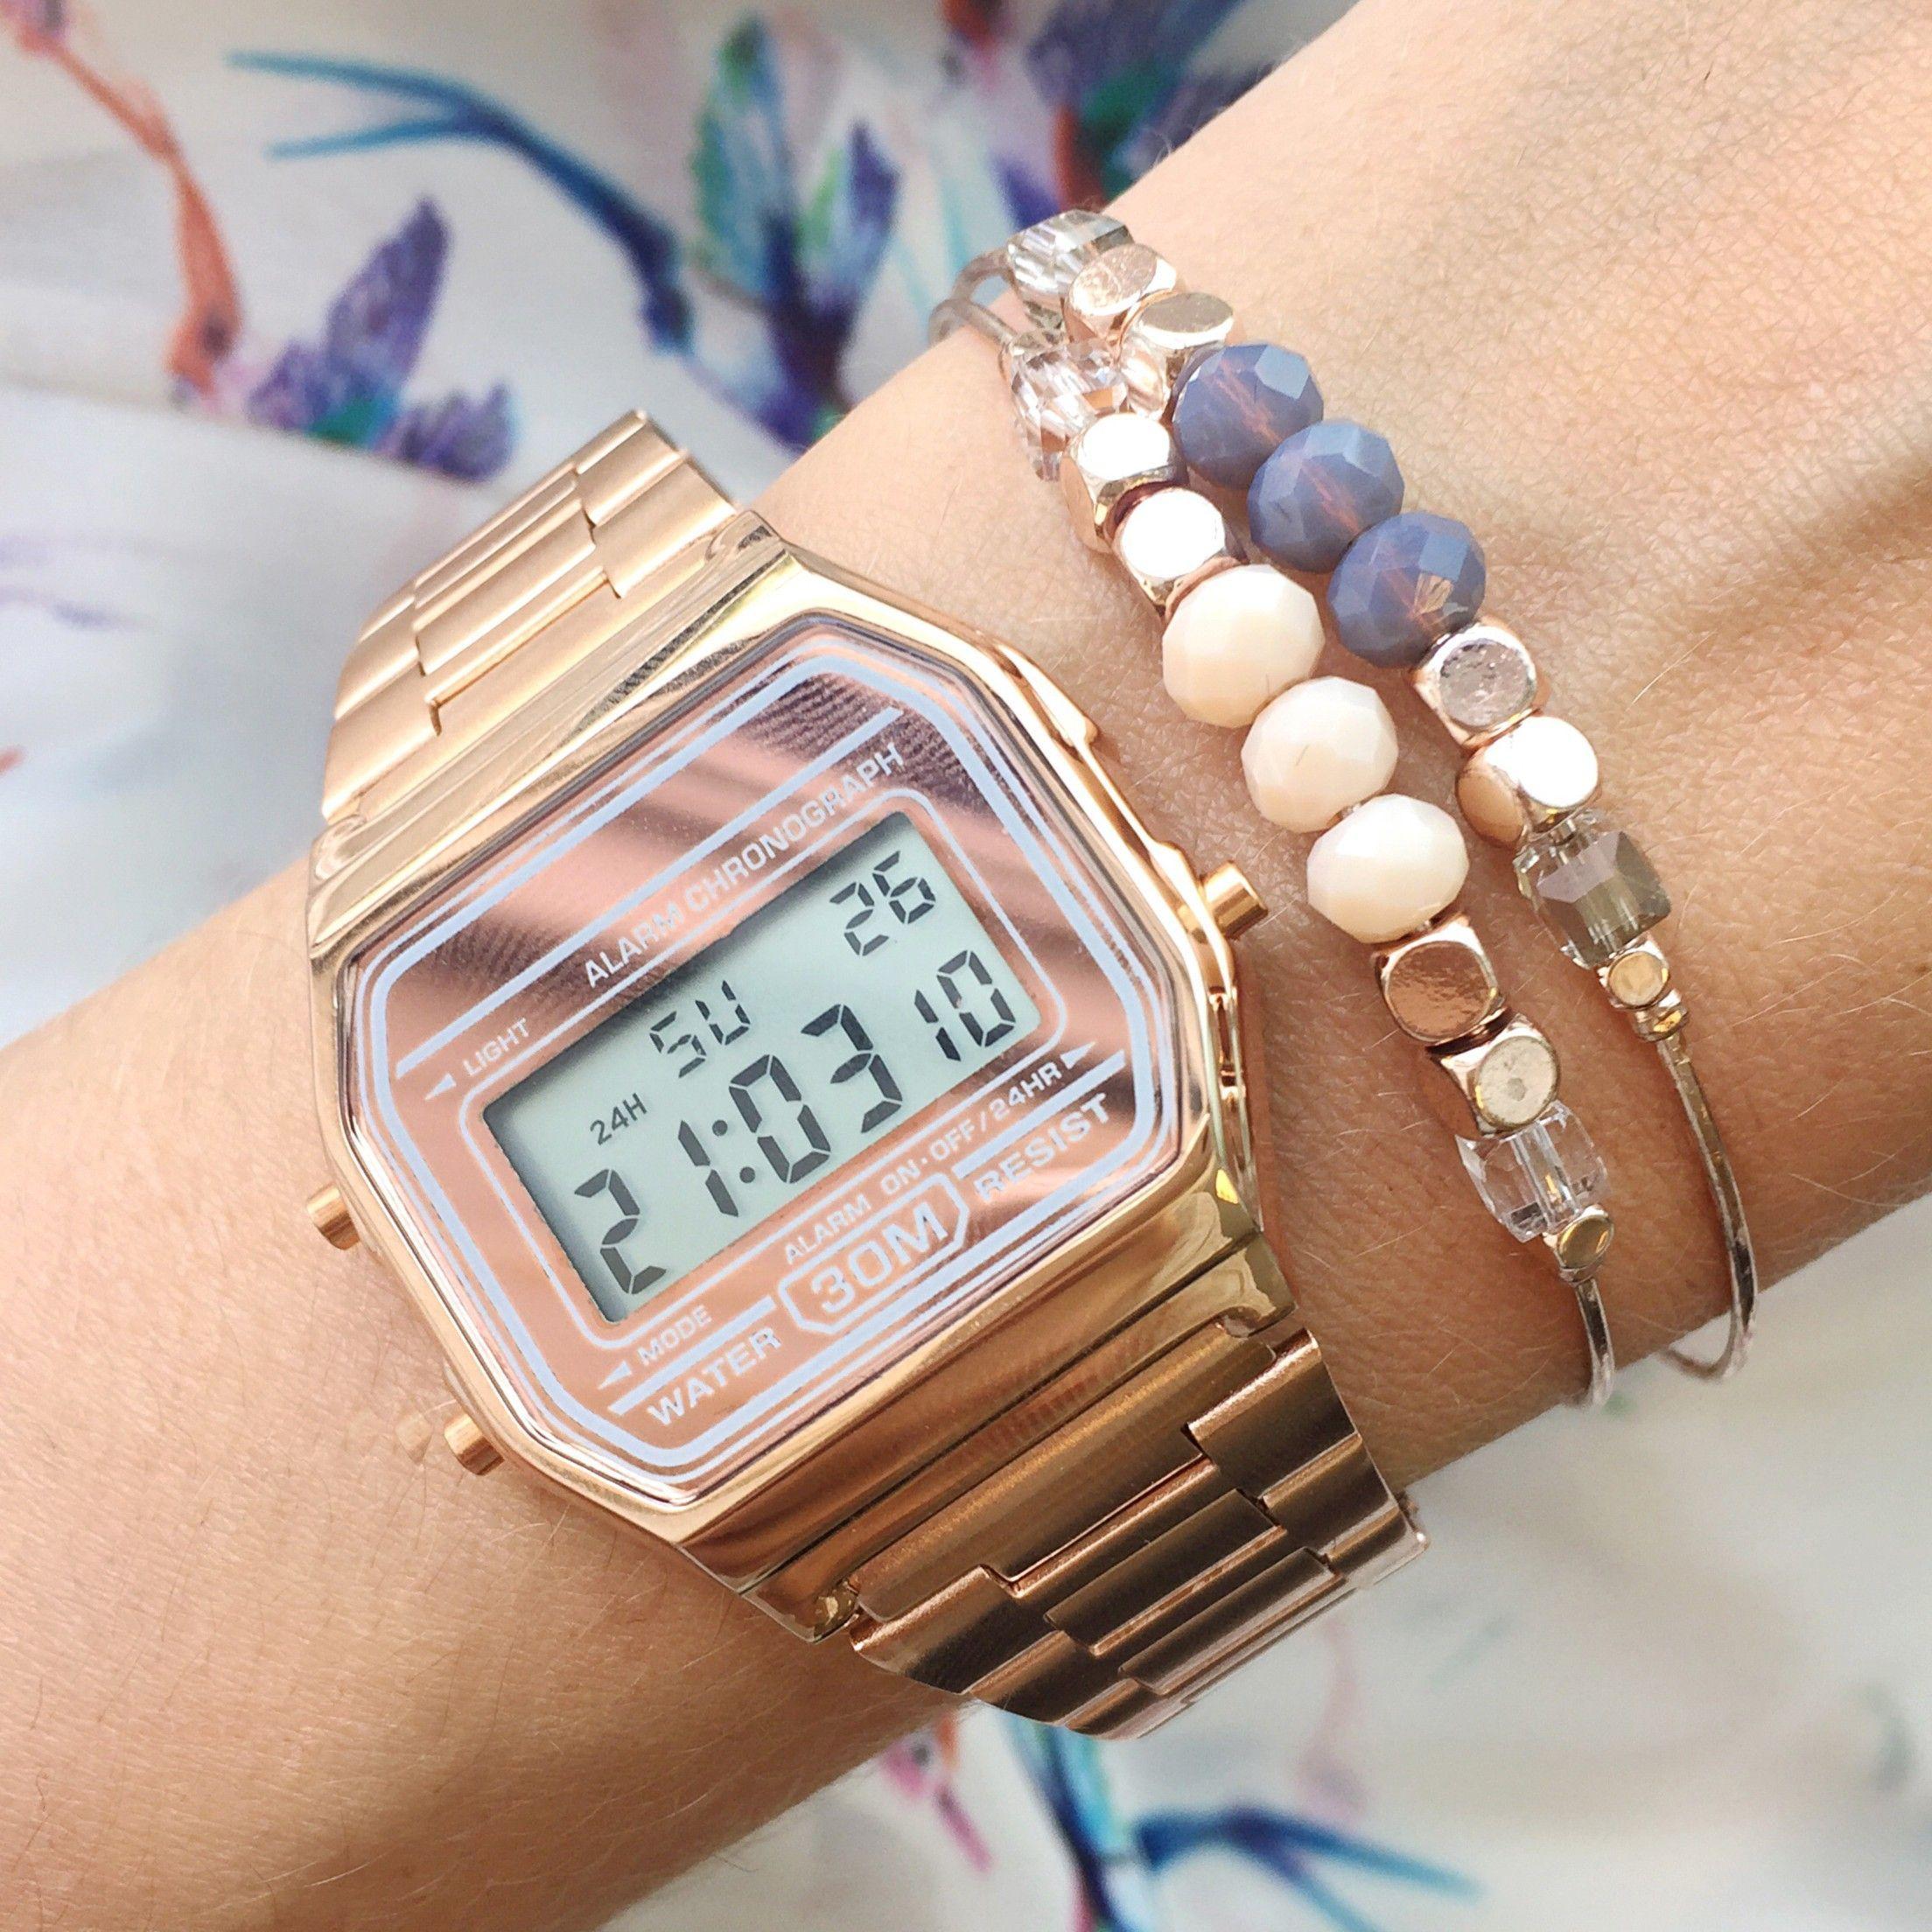 b420b9c7632 Vintage Casio Watch Rose  GoldInvesting